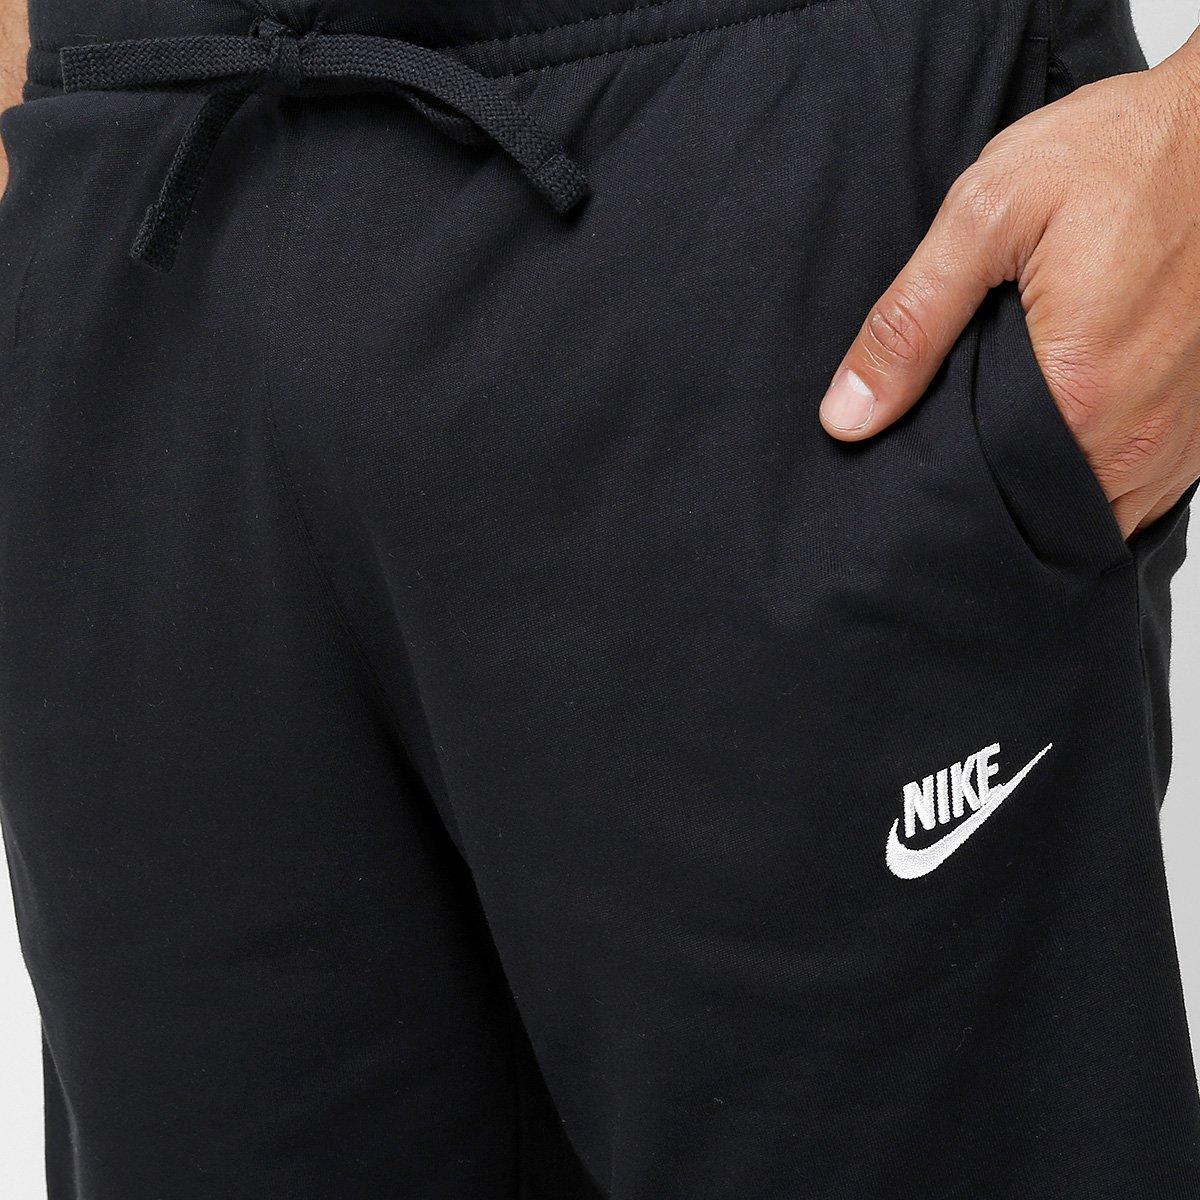 Bermuda Moletom Nike Jersey Club Reta Masculina - Preto e Branco ... fe600d88b6058